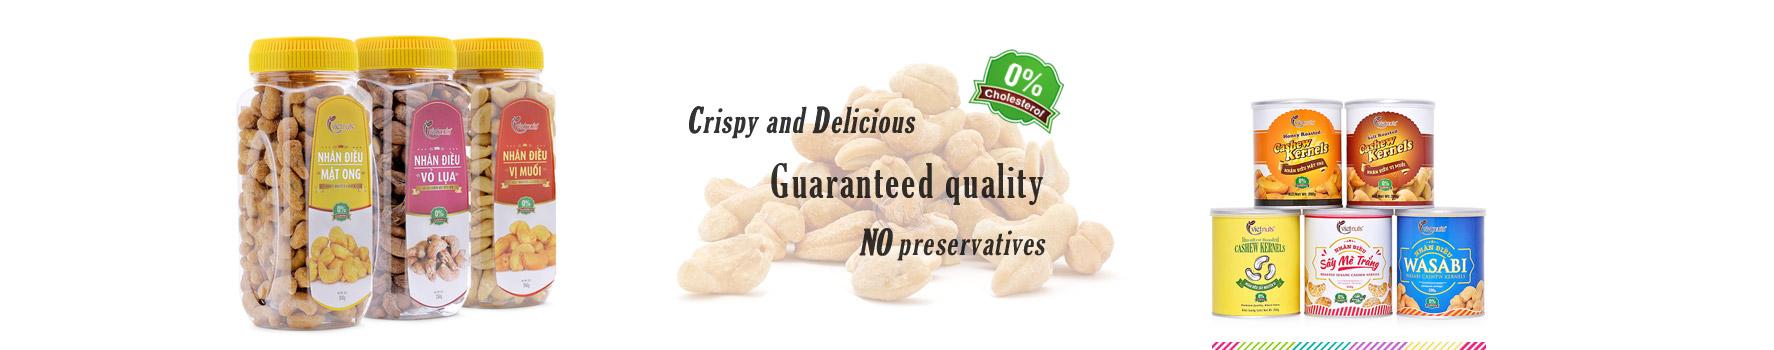 banner hạt điều Vietnuts - Viet Nam premium cashew supplier